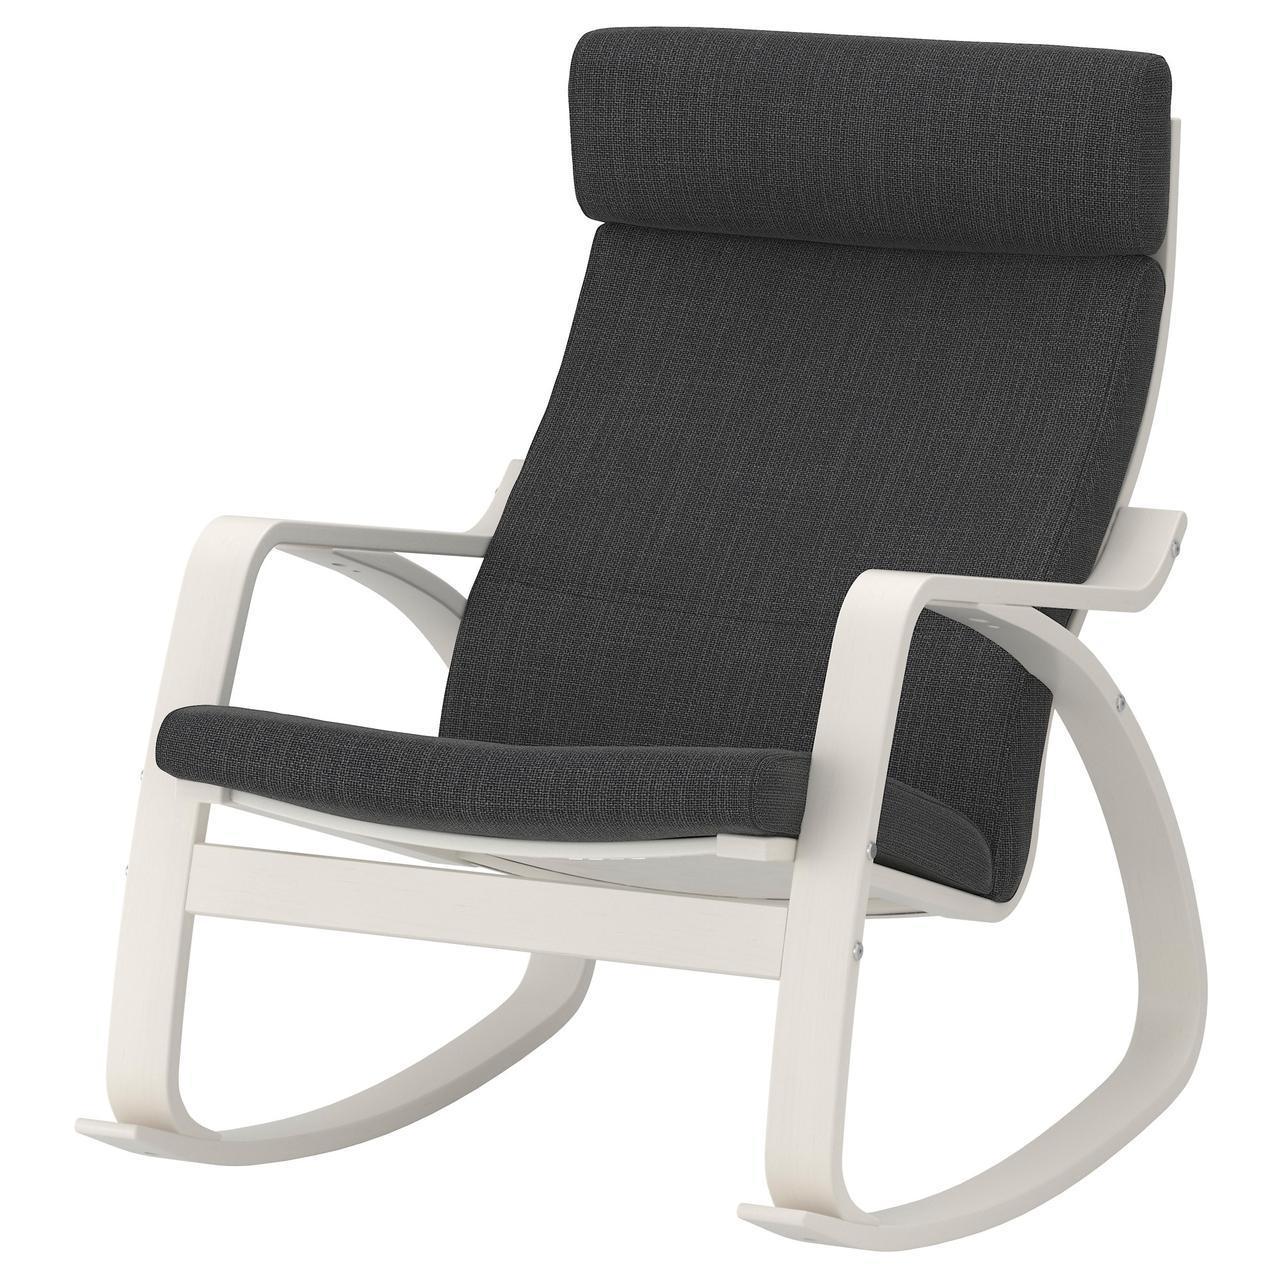 IKEA POANG Кресло-качалка, белый, Hillared антрацит  (692.010.44)